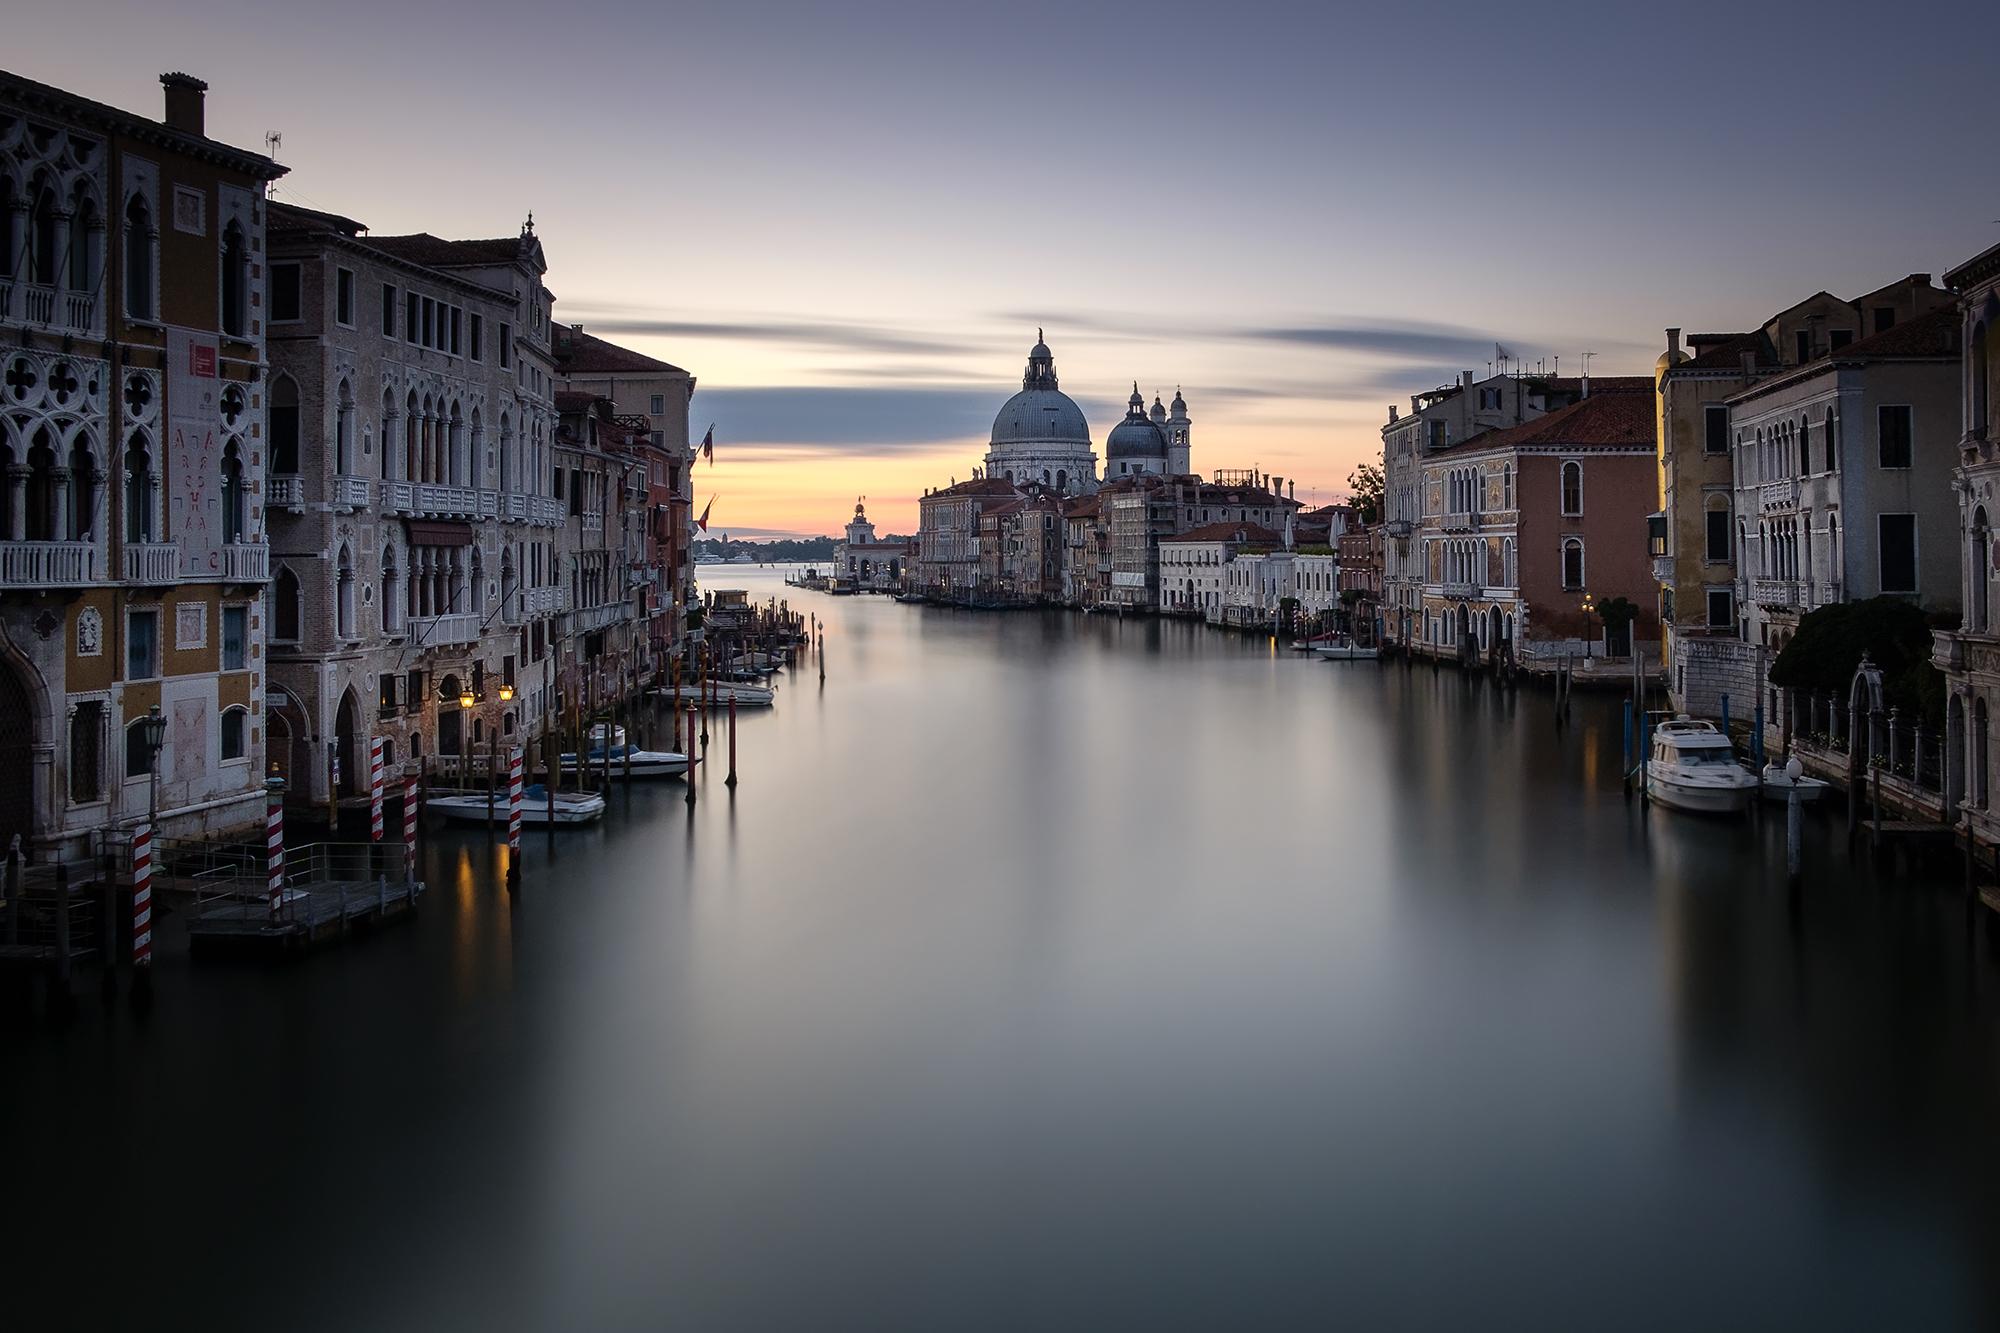 170727 - Venice - Sunrise - Grand Canal 003.jpg